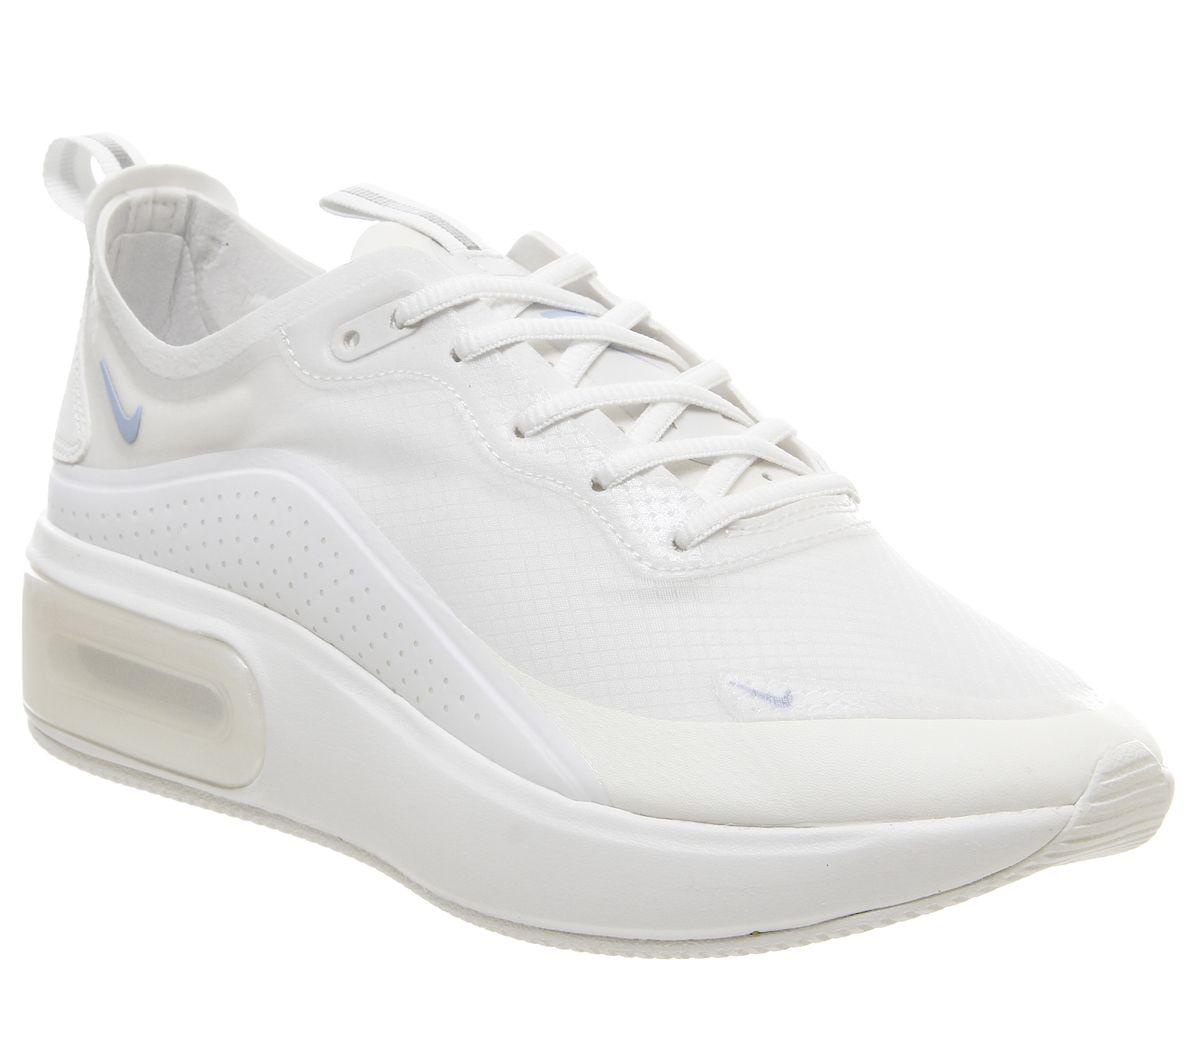 new arrival a9cf3 ddf23 Nike Air Max Dia Trainers Summit White Black Summit White F - Hers ...